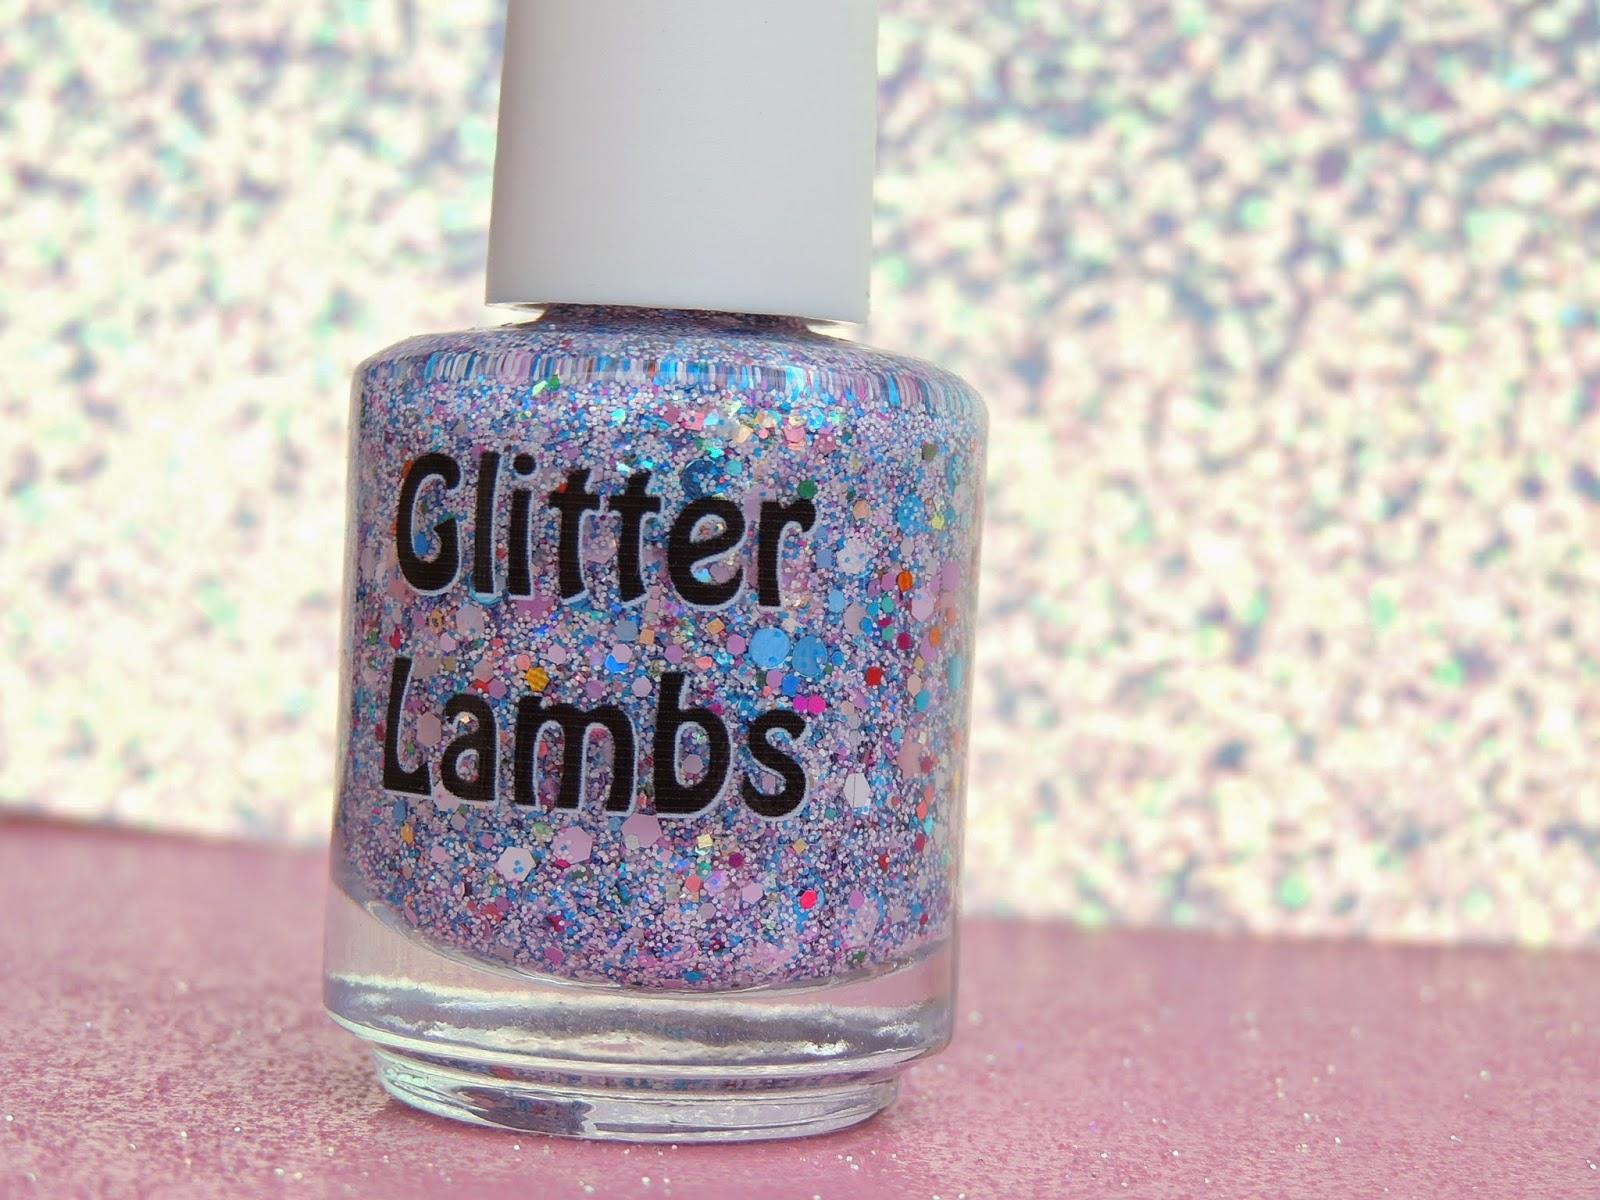 Piggy Bubble Bath  Glitter Topper Nail Polish  By Glitter Lambs